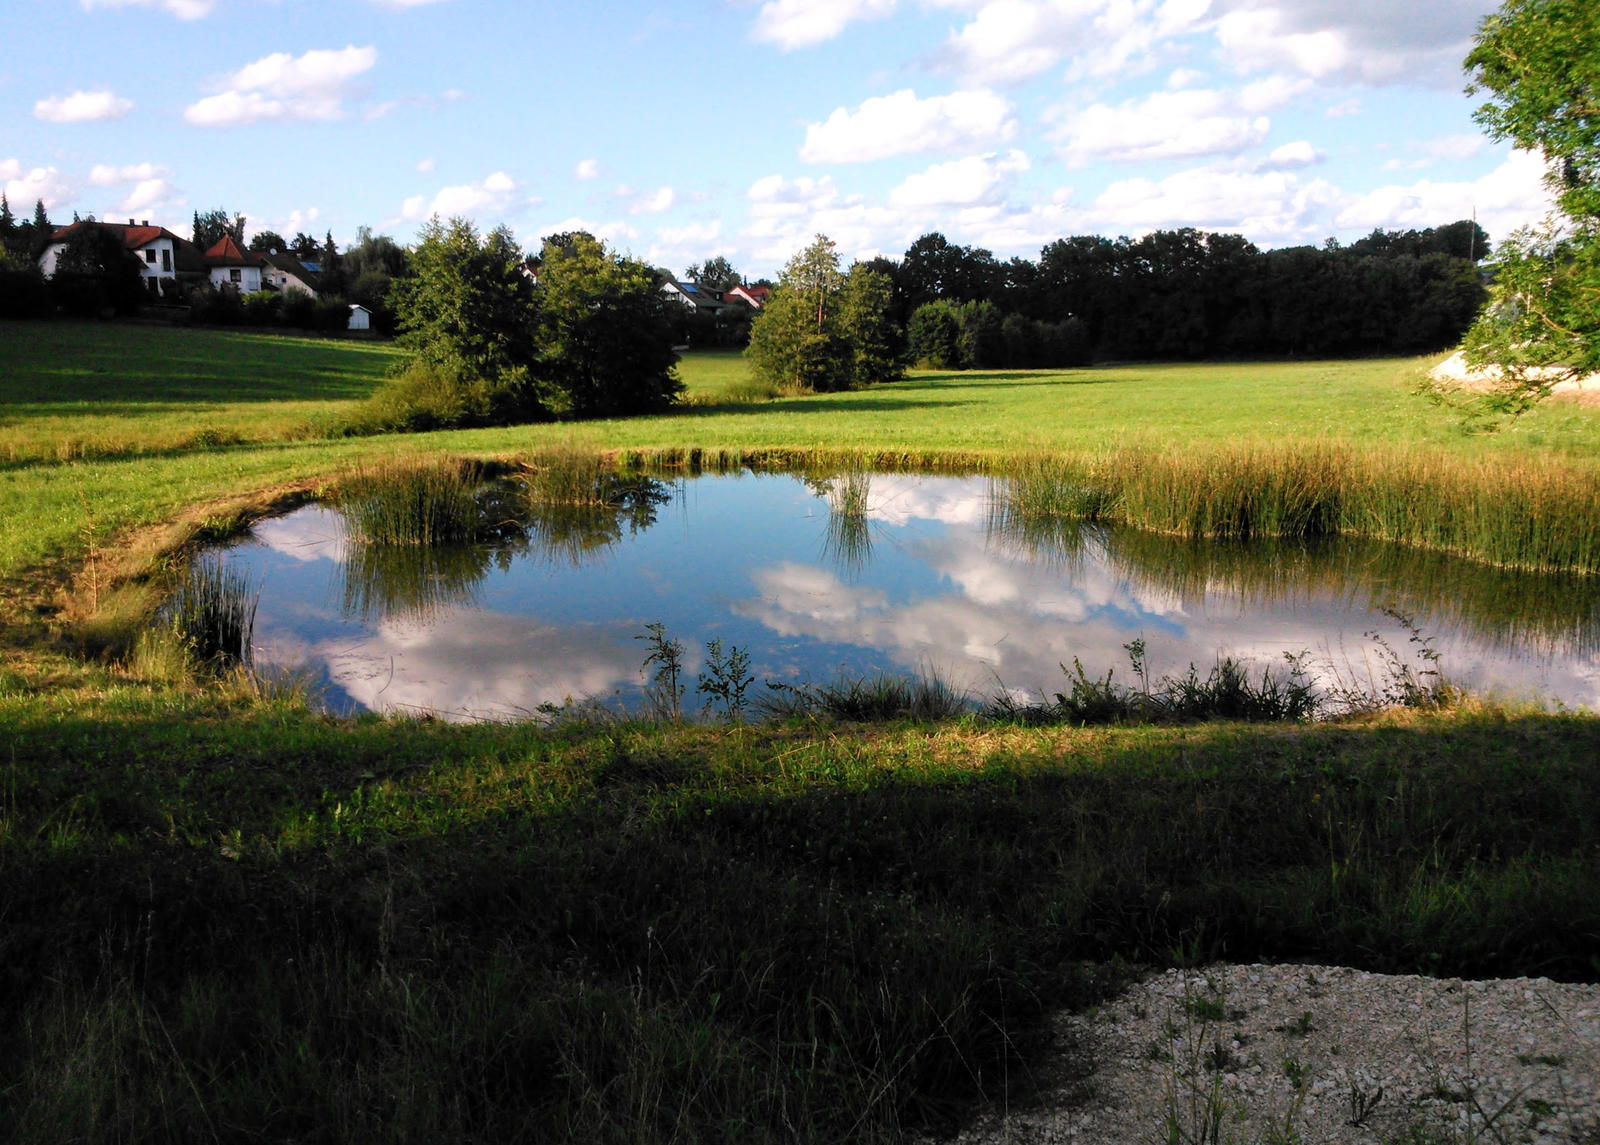 pond and sky by Mittelfranke